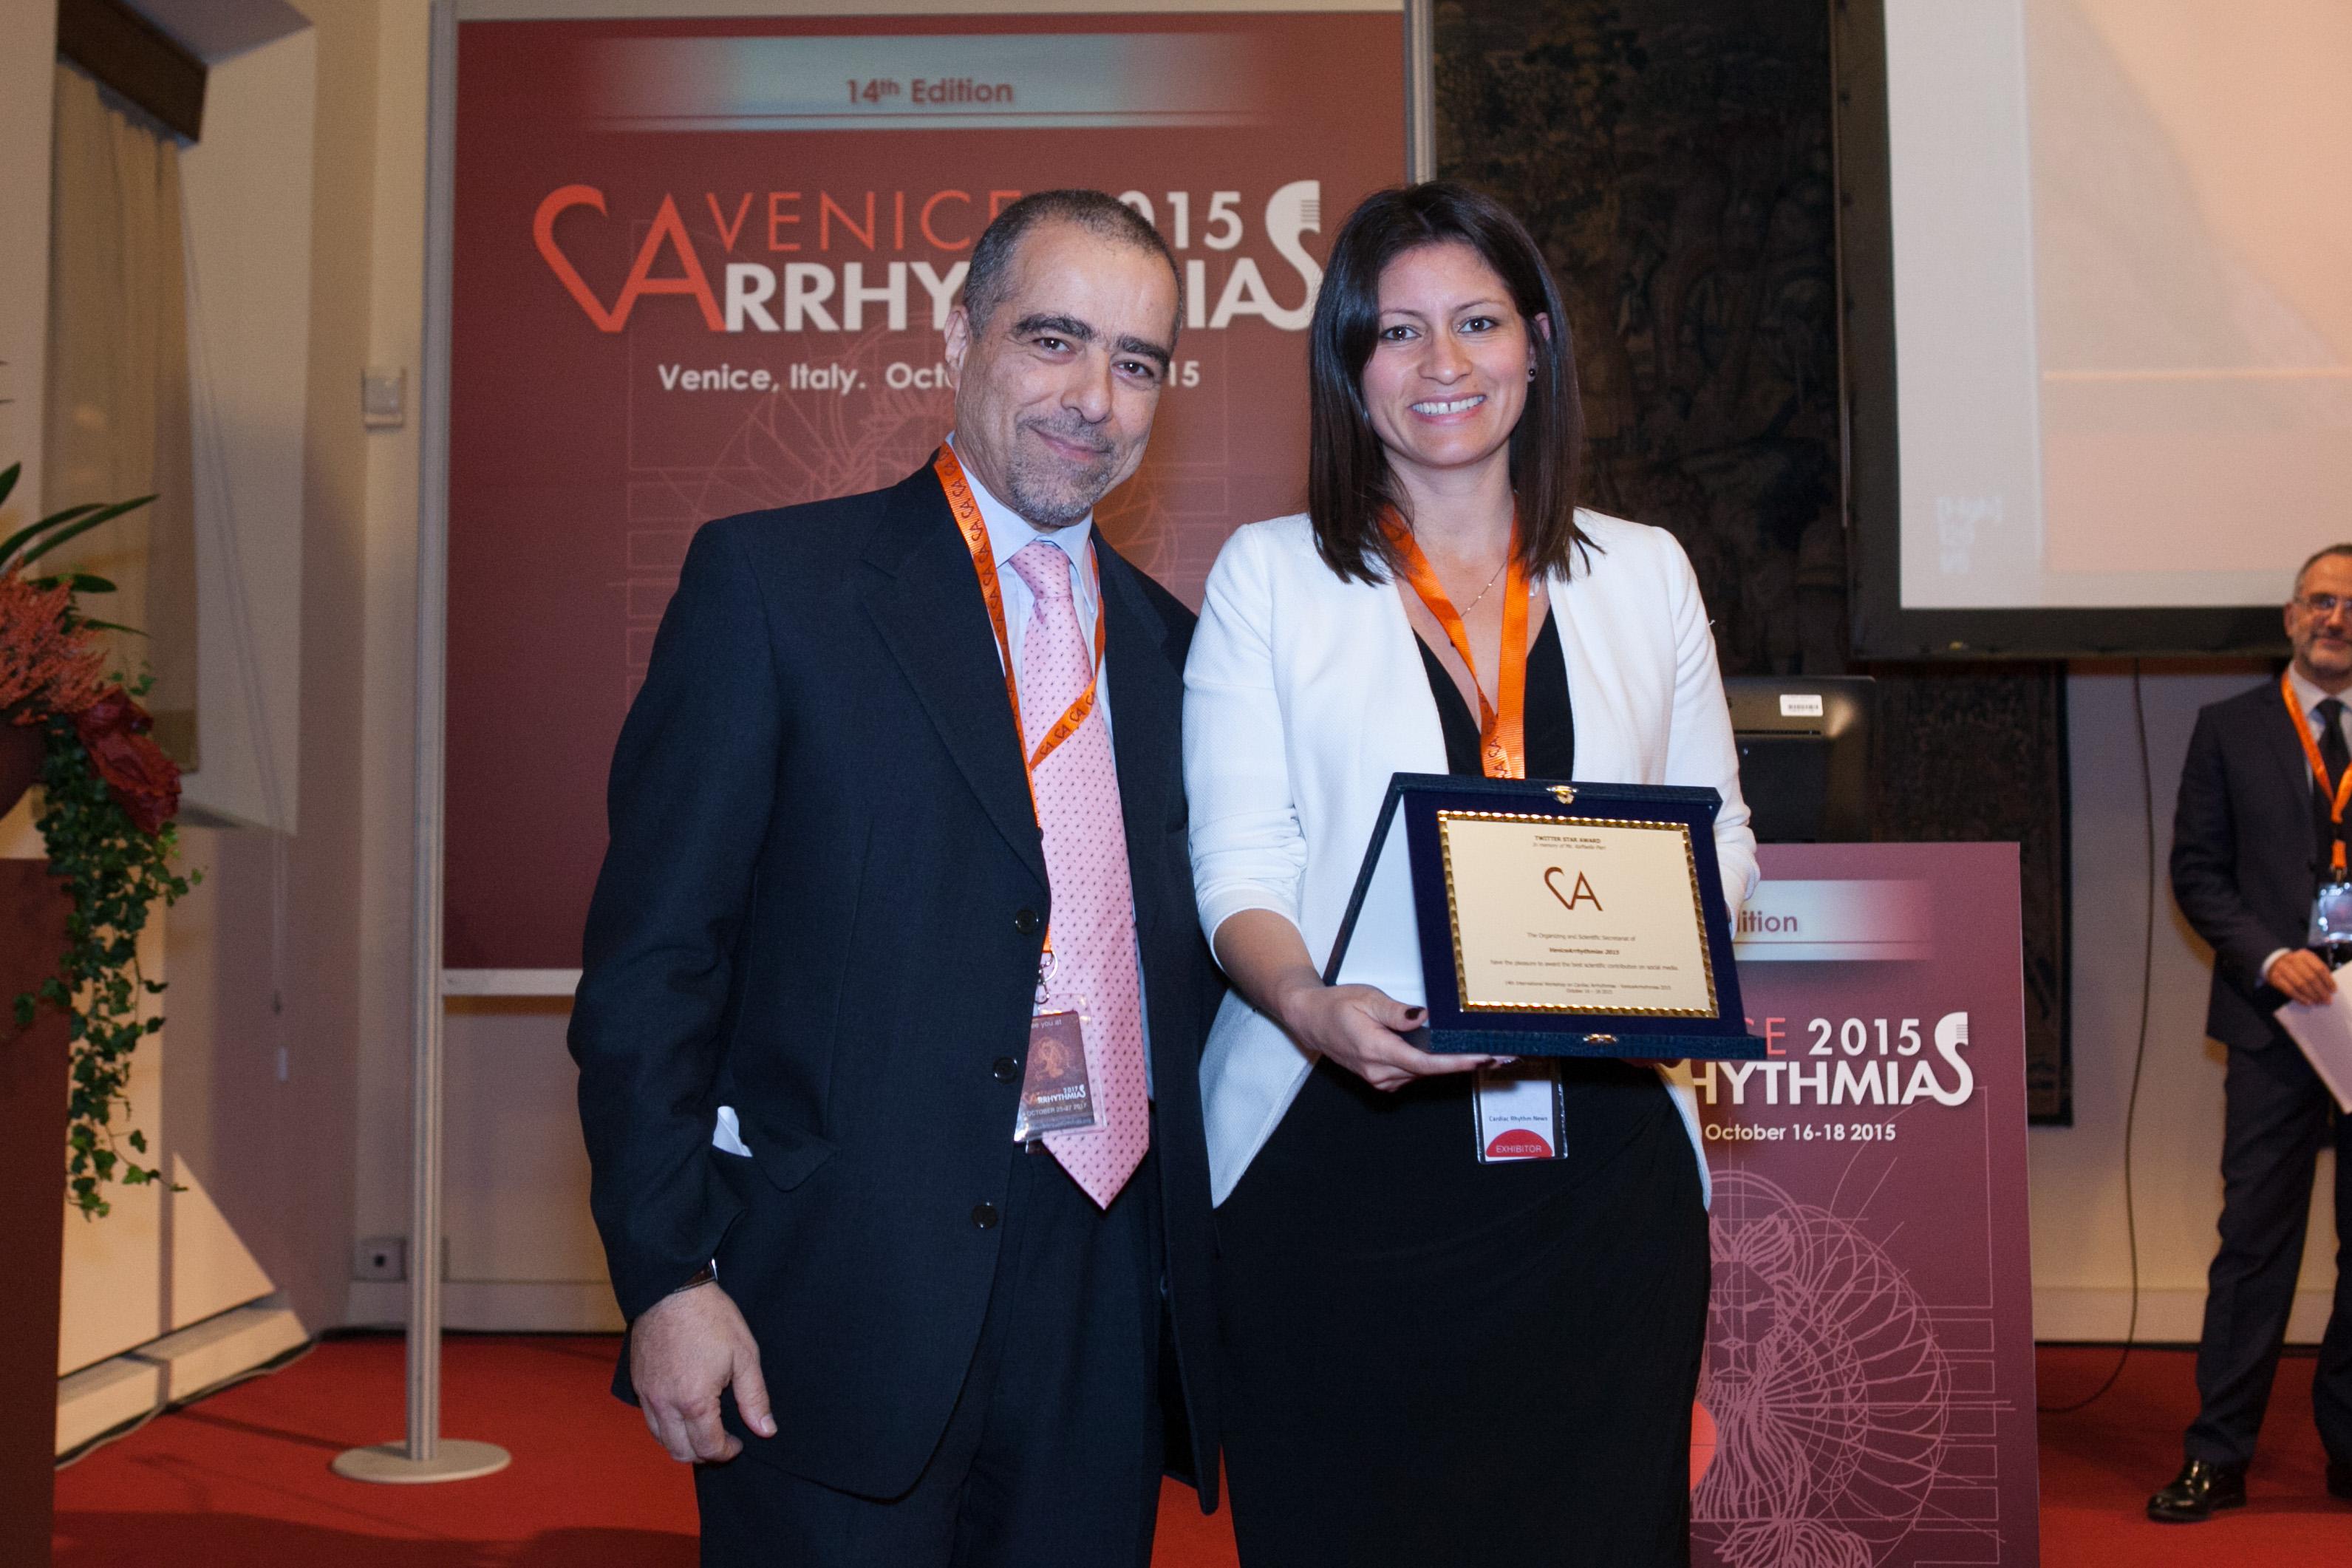 Award in memory of Raffaella Pieri